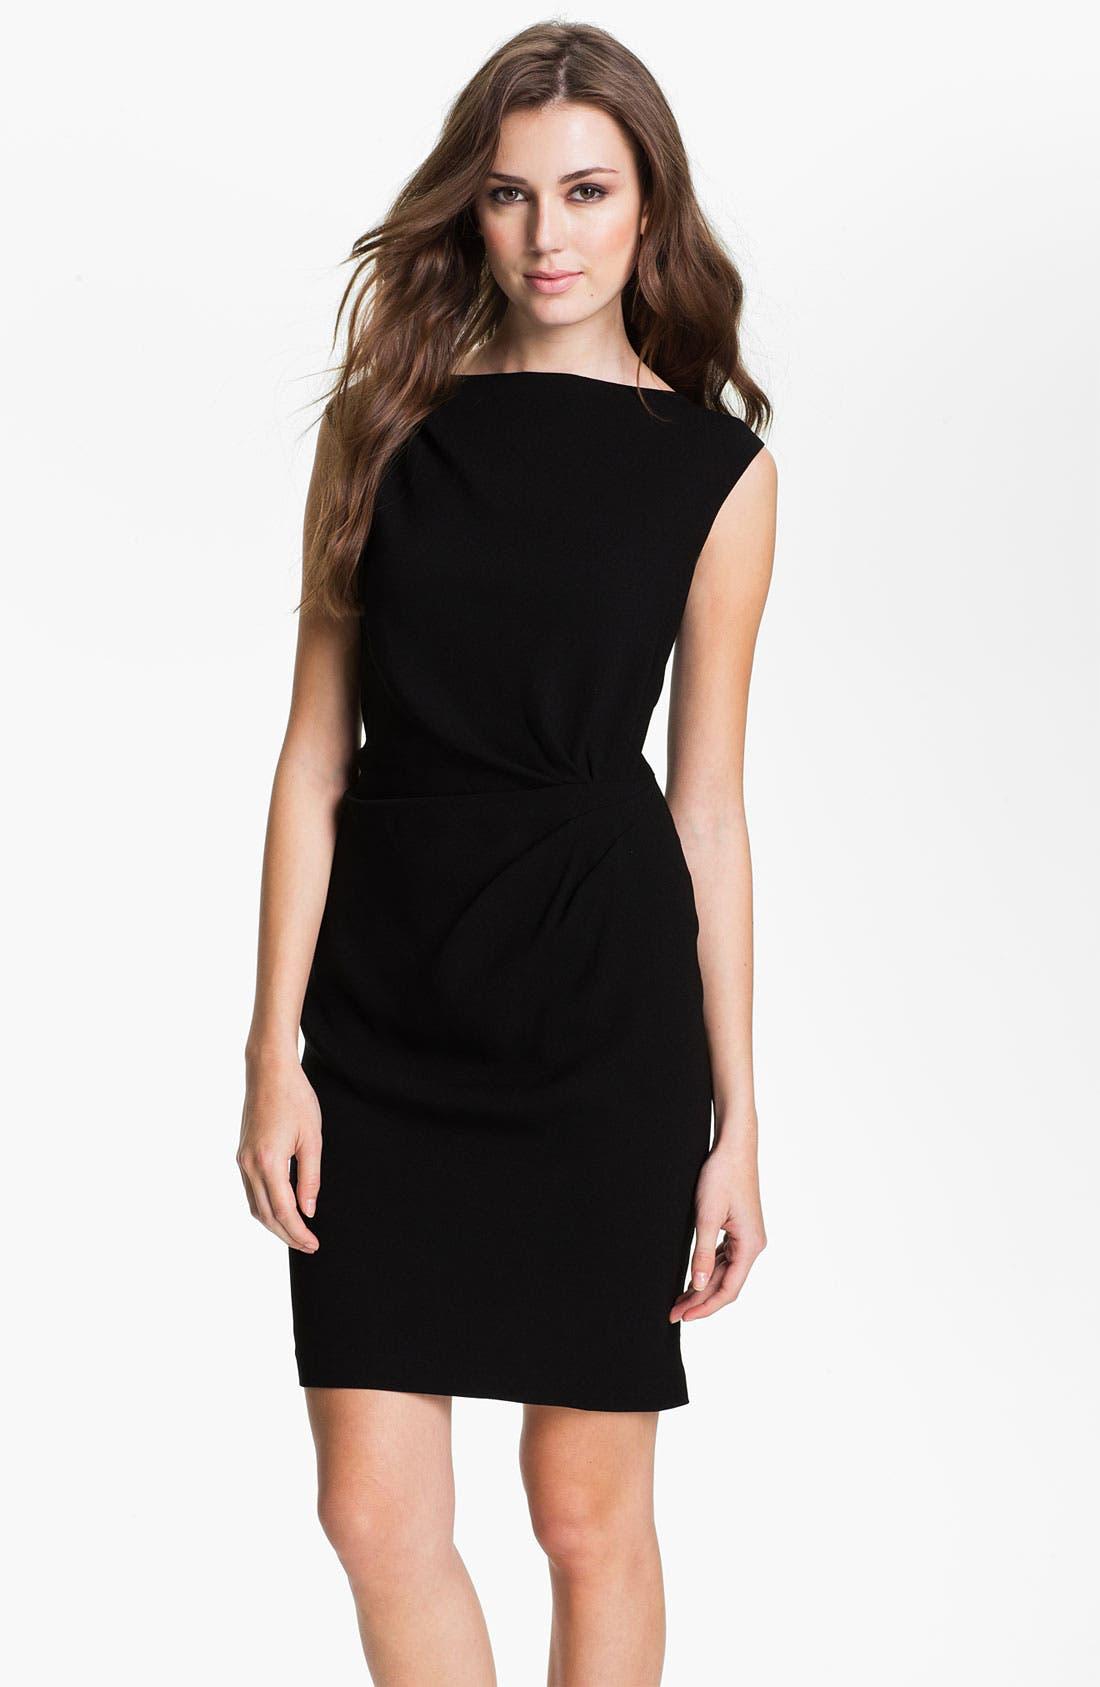 Main Image - Suzi Chin for Maggy Boutique Side Draped Sheath Dress